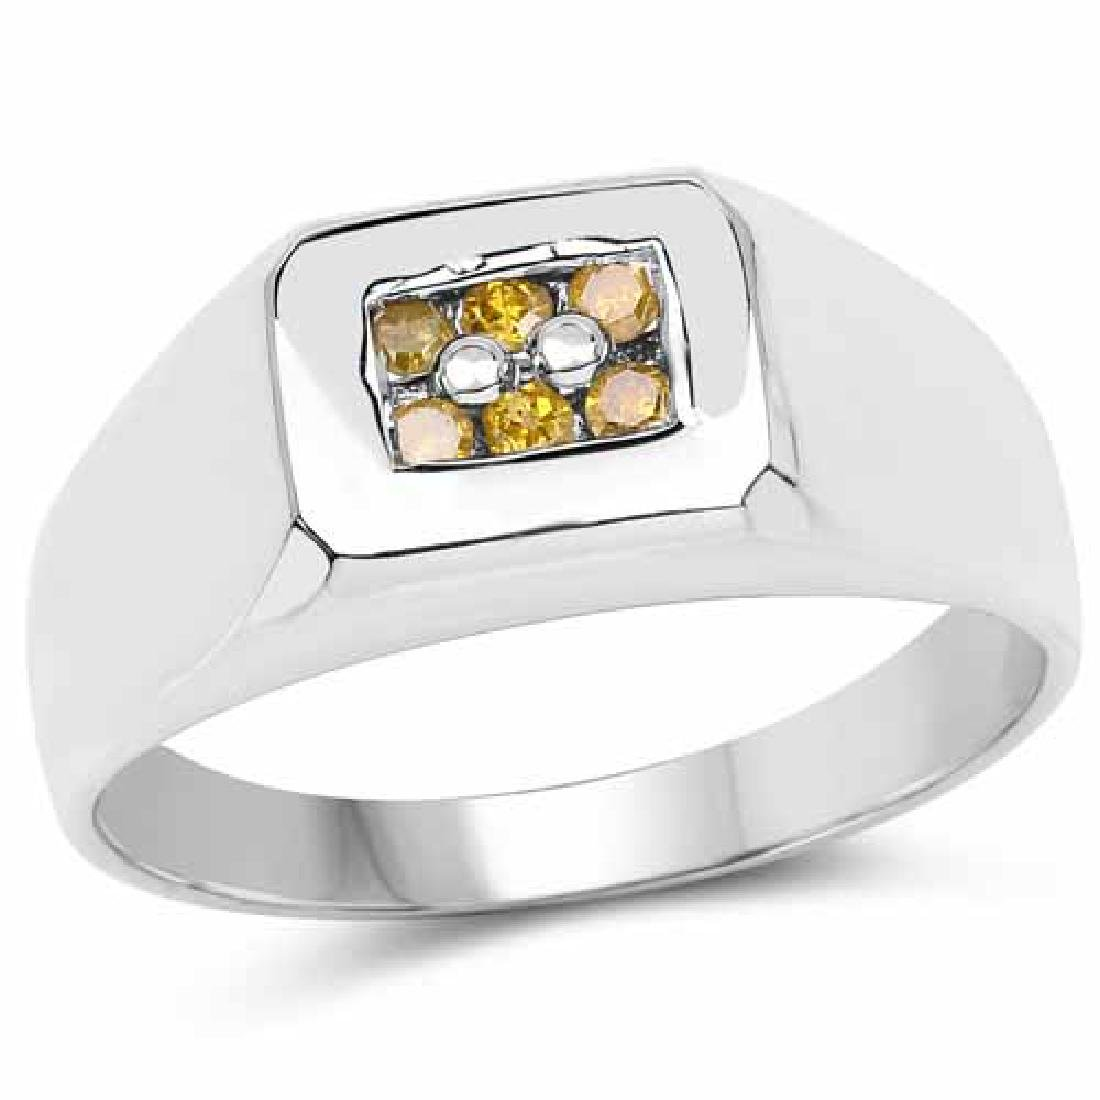 0.14 Carat Genuine Yellow Diamond .925 Sterling Silver